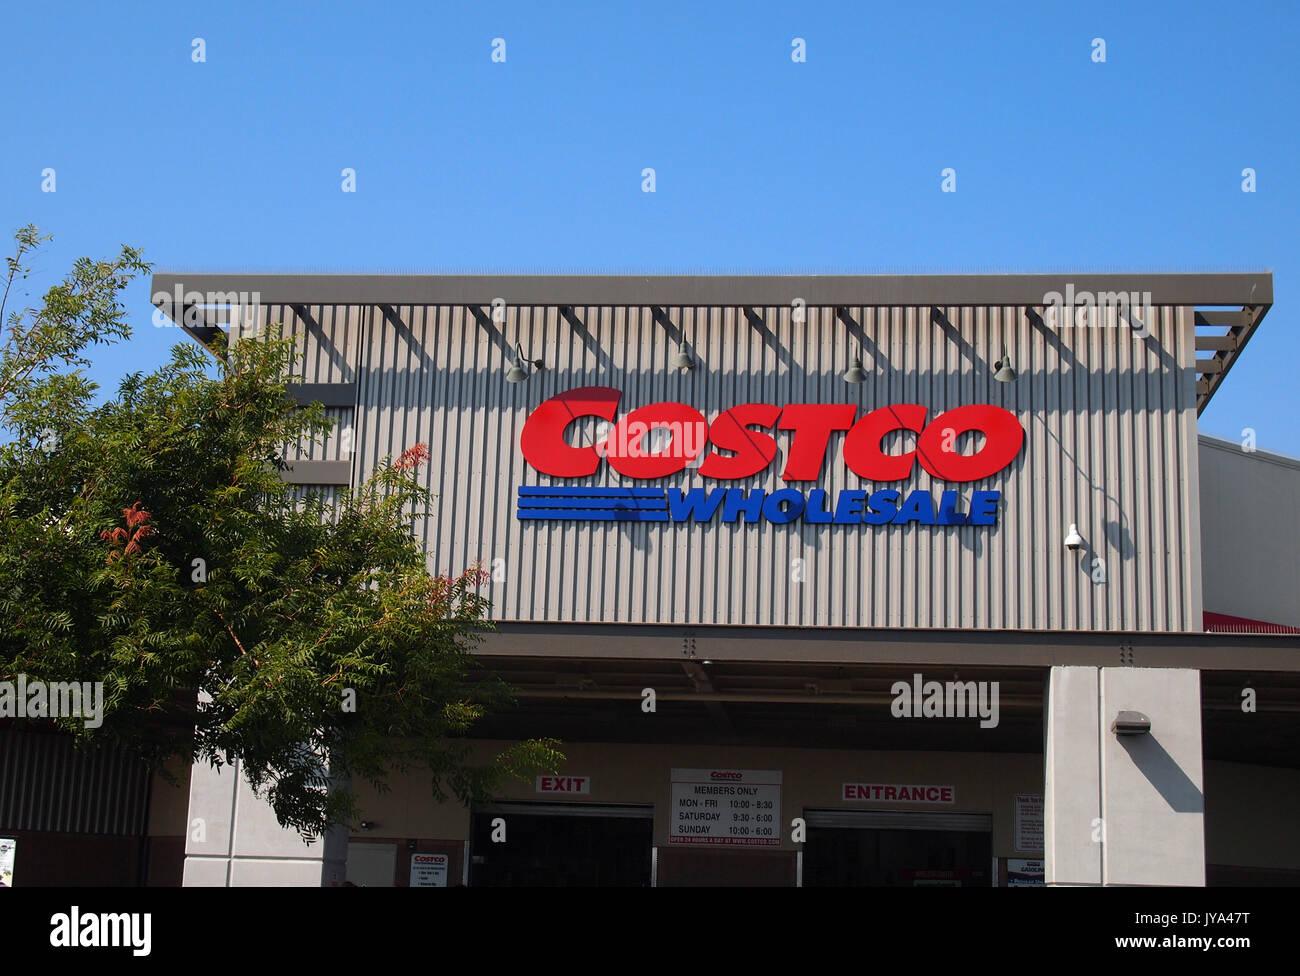 Costco wholesale store, Hayward, California - Stock Image